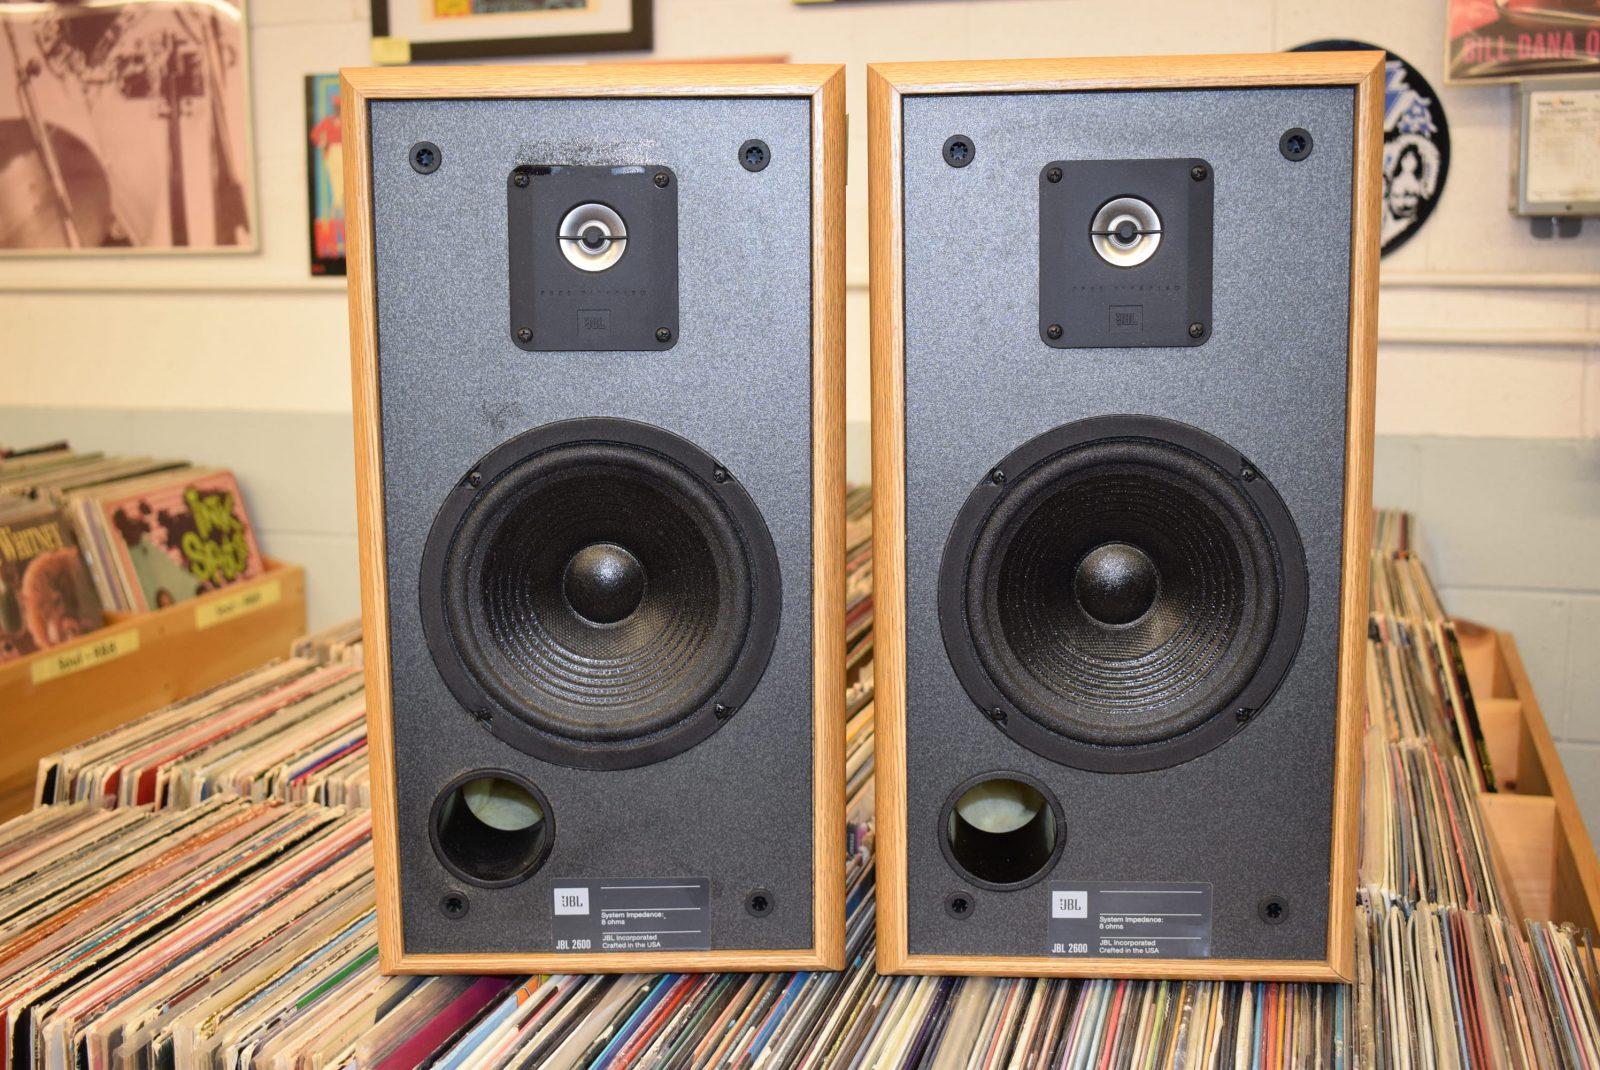 JBL Speakers - Model: 2600